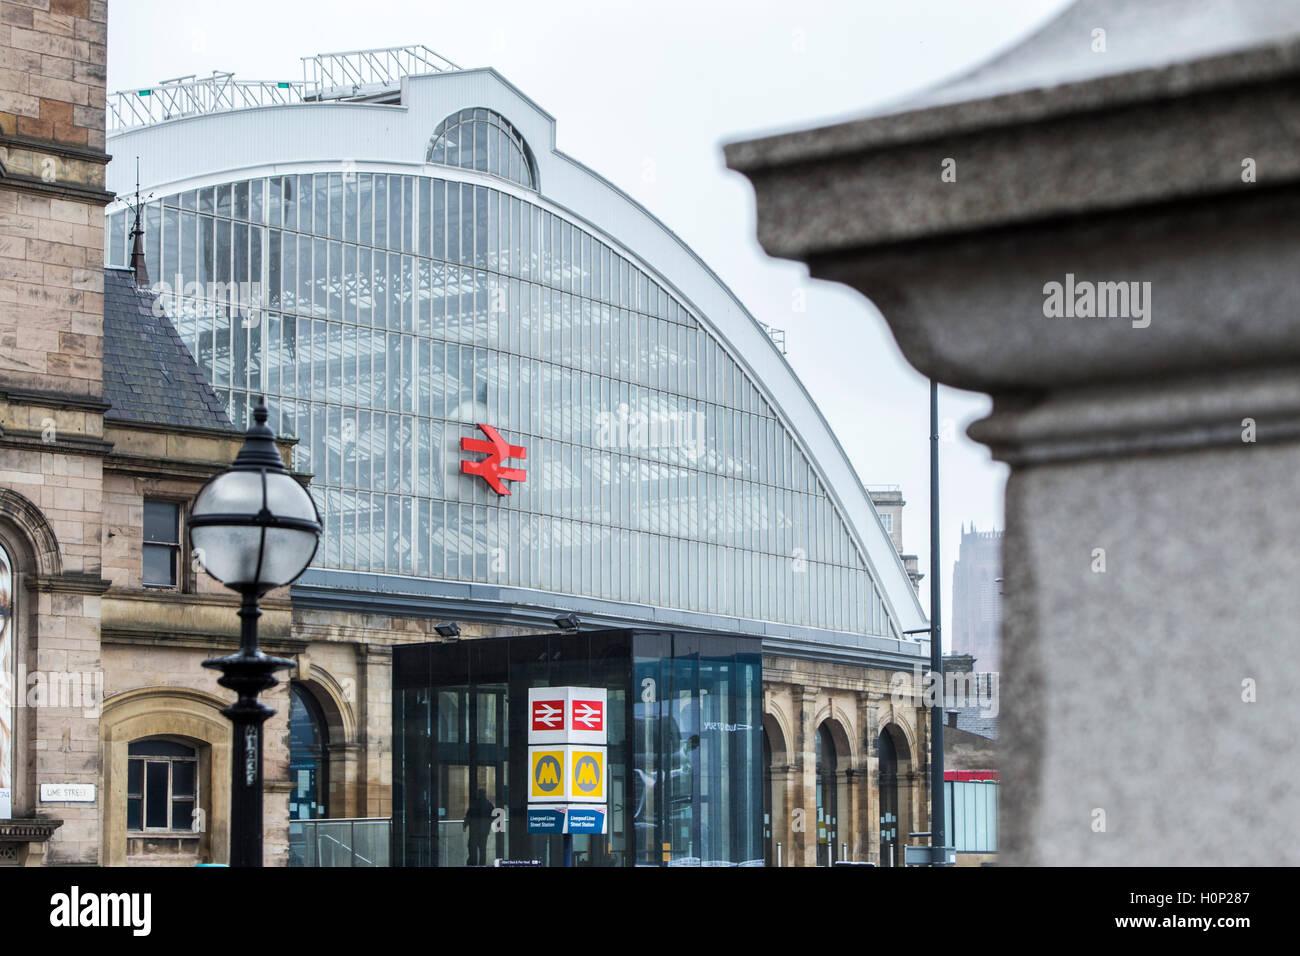 Forex liverpool street station